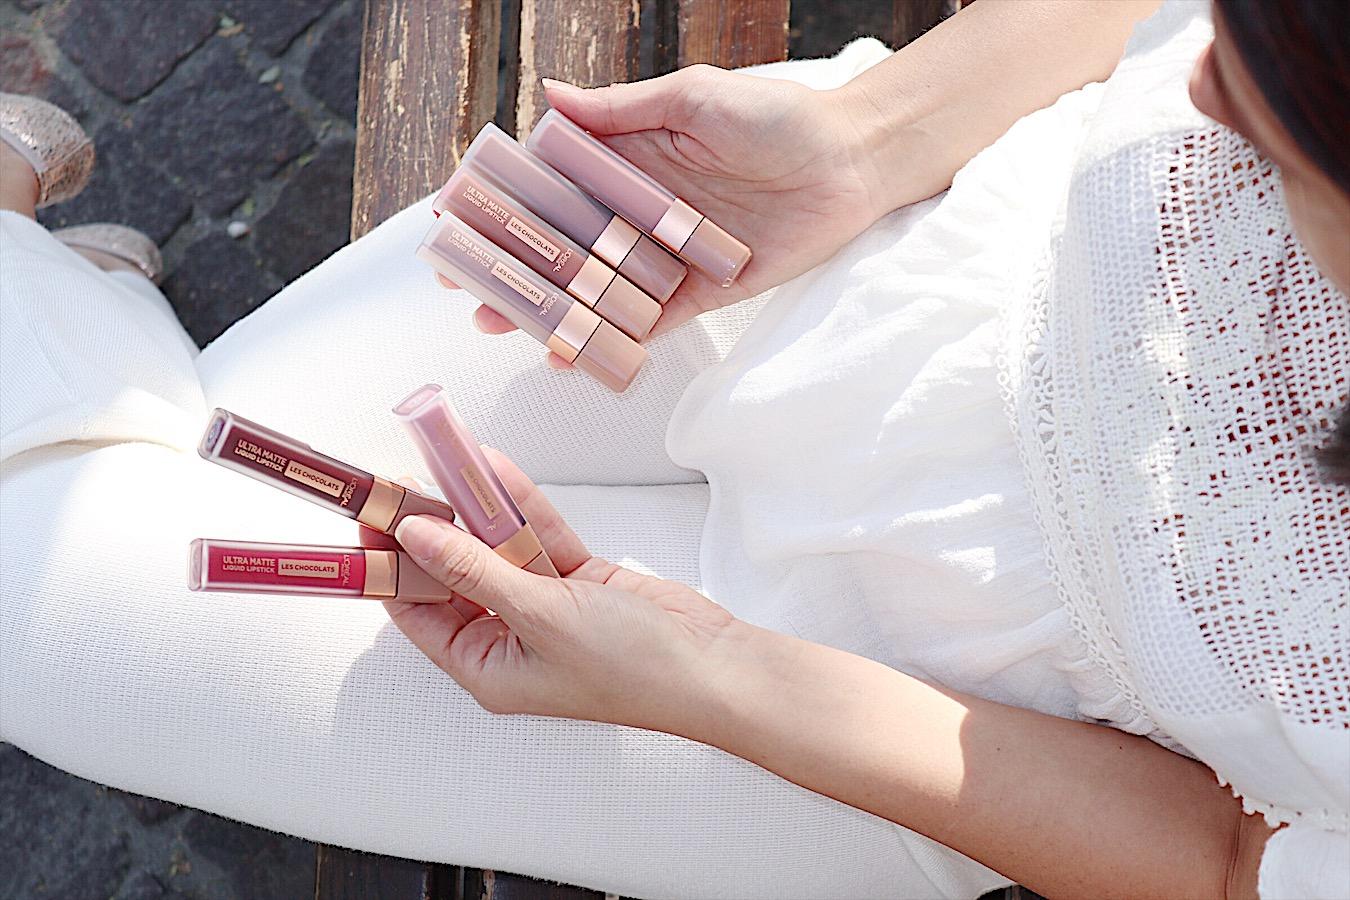 Unlimited Mascara e rossetti liquidi Les Chocolats di L'Oréal